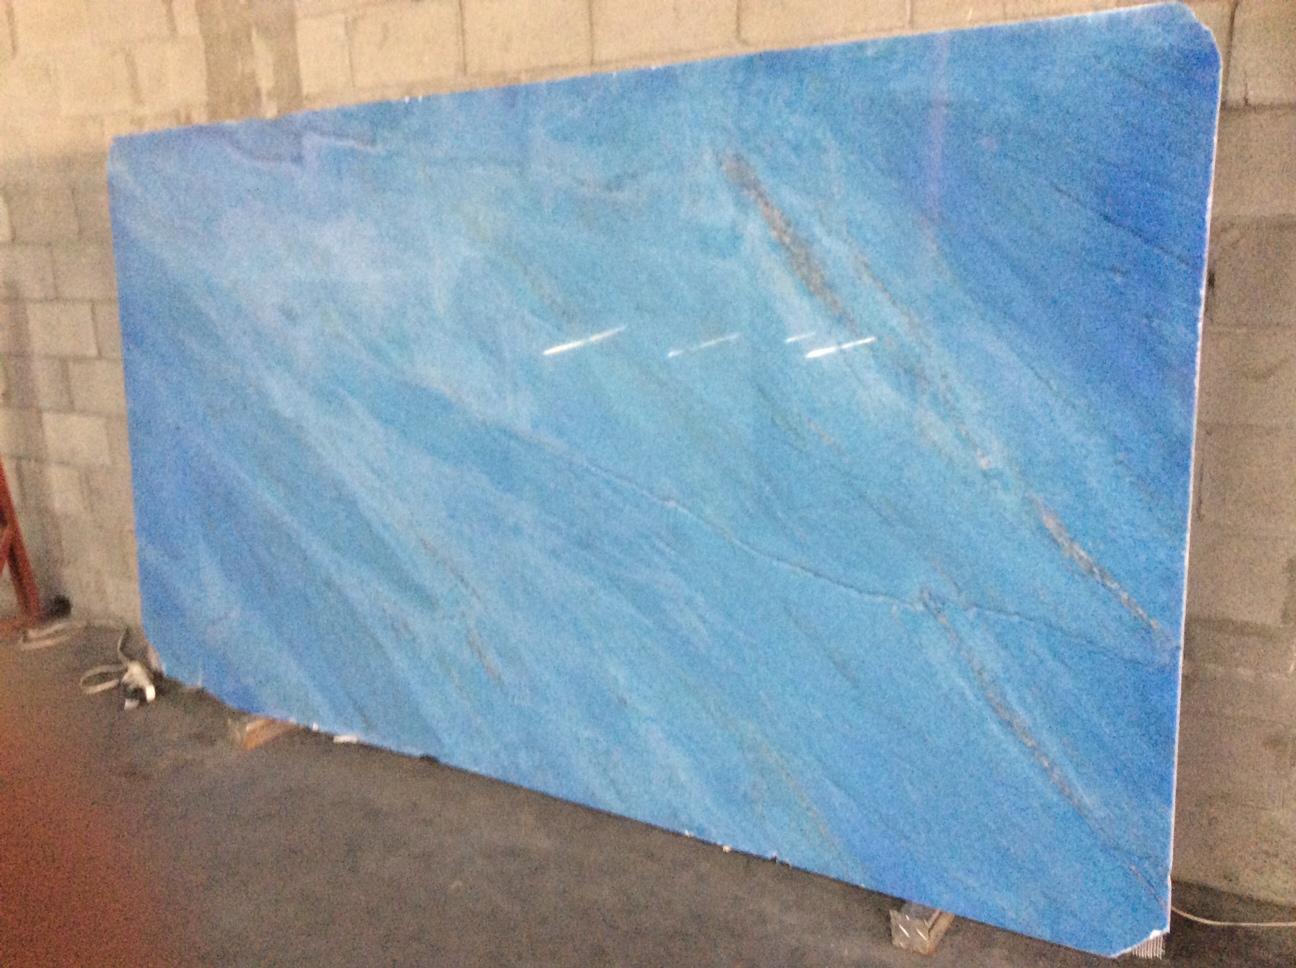 Crystaline Stone Ocean Blue Marble Image Proview